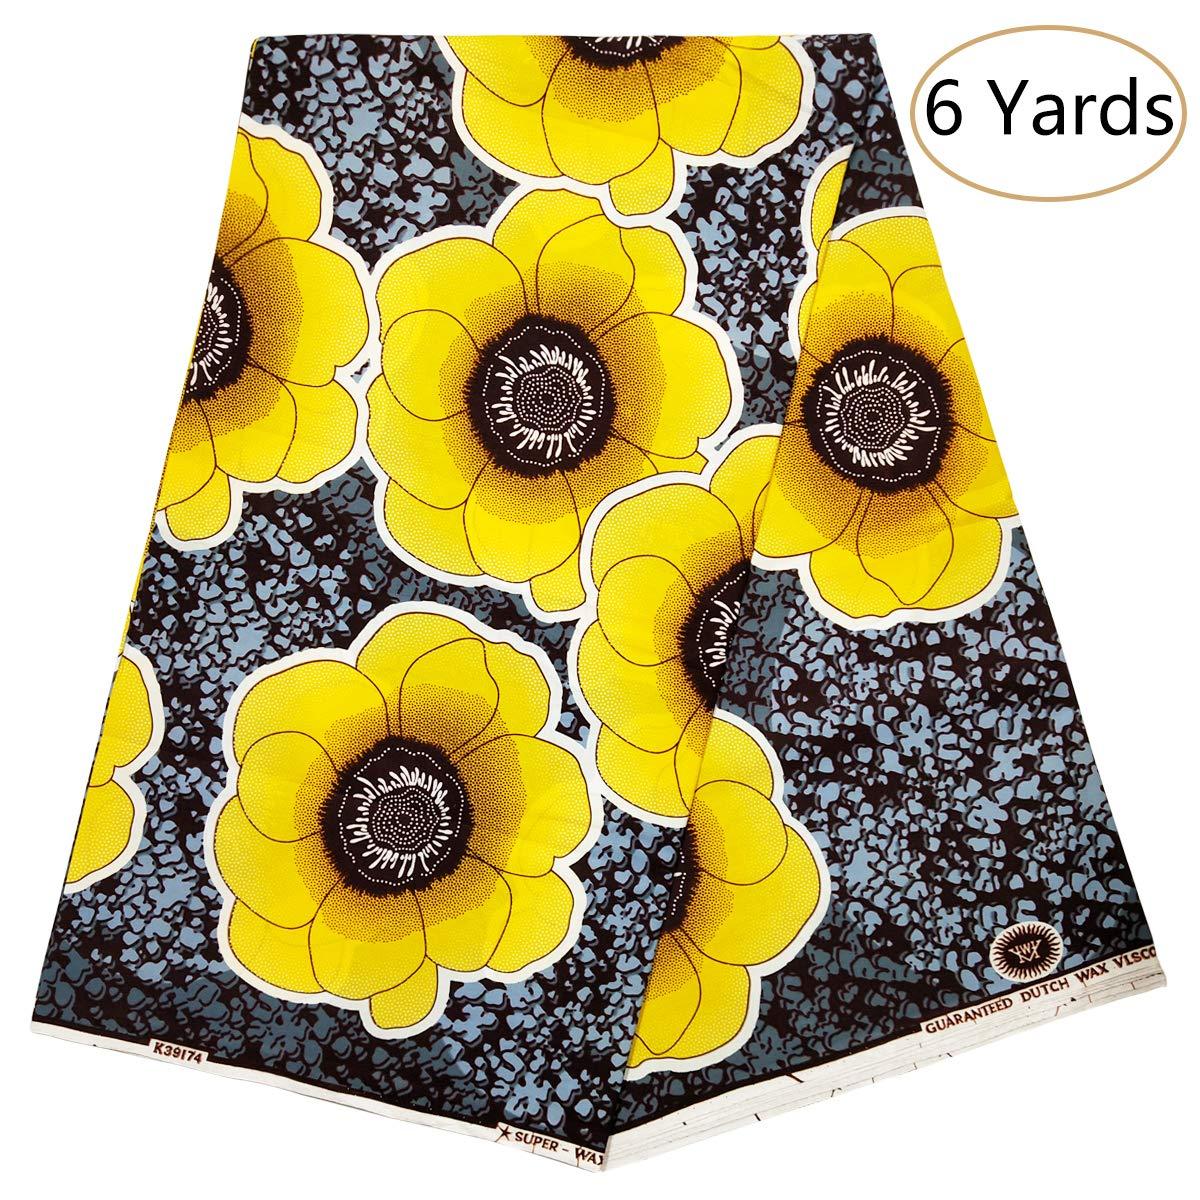 Dexuelan New Africa Ankara Supreme Wax Print Fabric 6 Yards African Fashion Fabrics for Party Dress